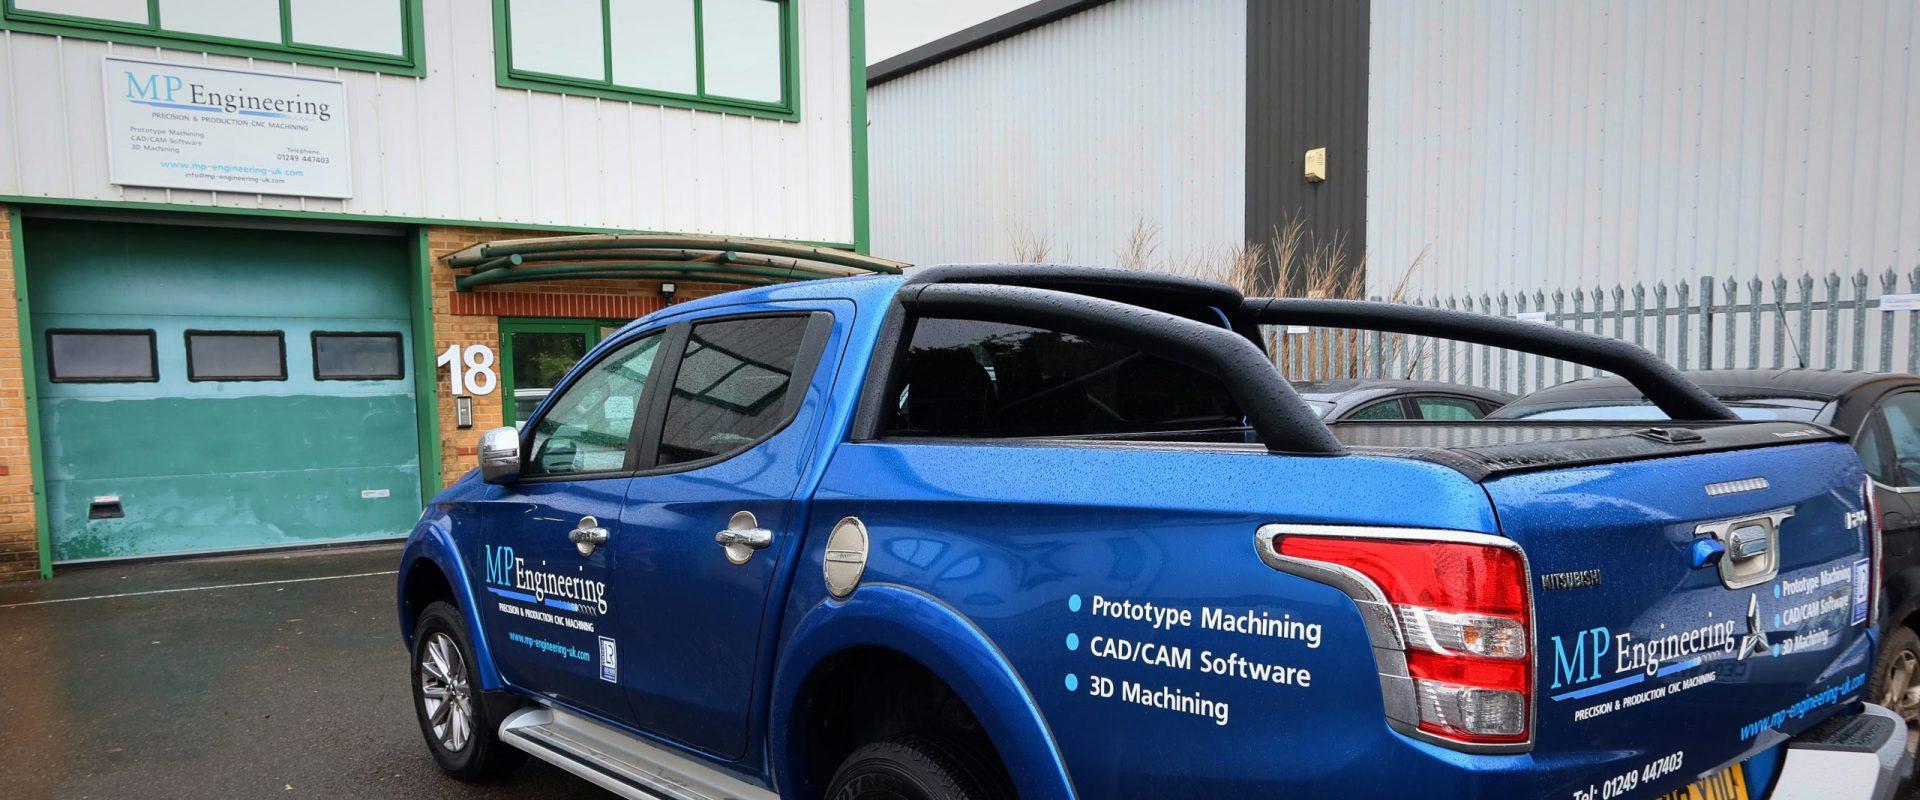 MP Engineering (Chippenham) Wiltshire